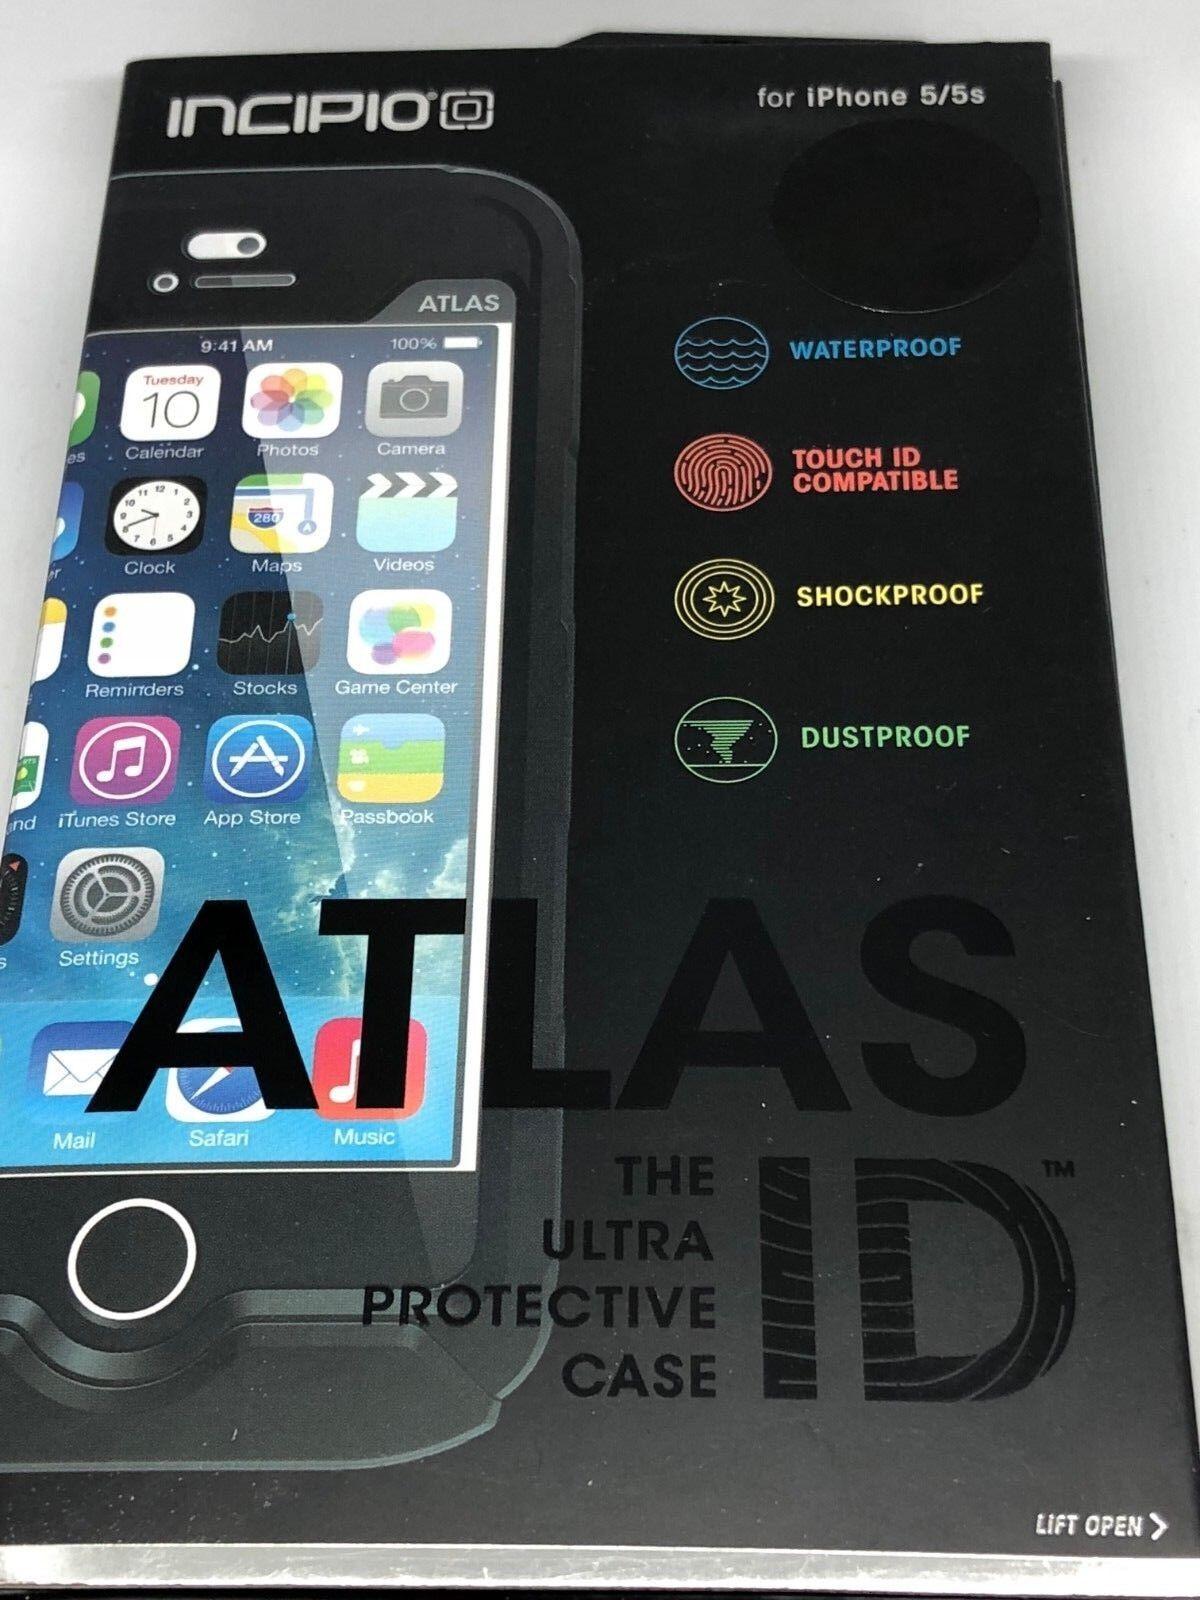 Incipio Atlas ID Waterproof Fingerprint Touch ID Case iPhone